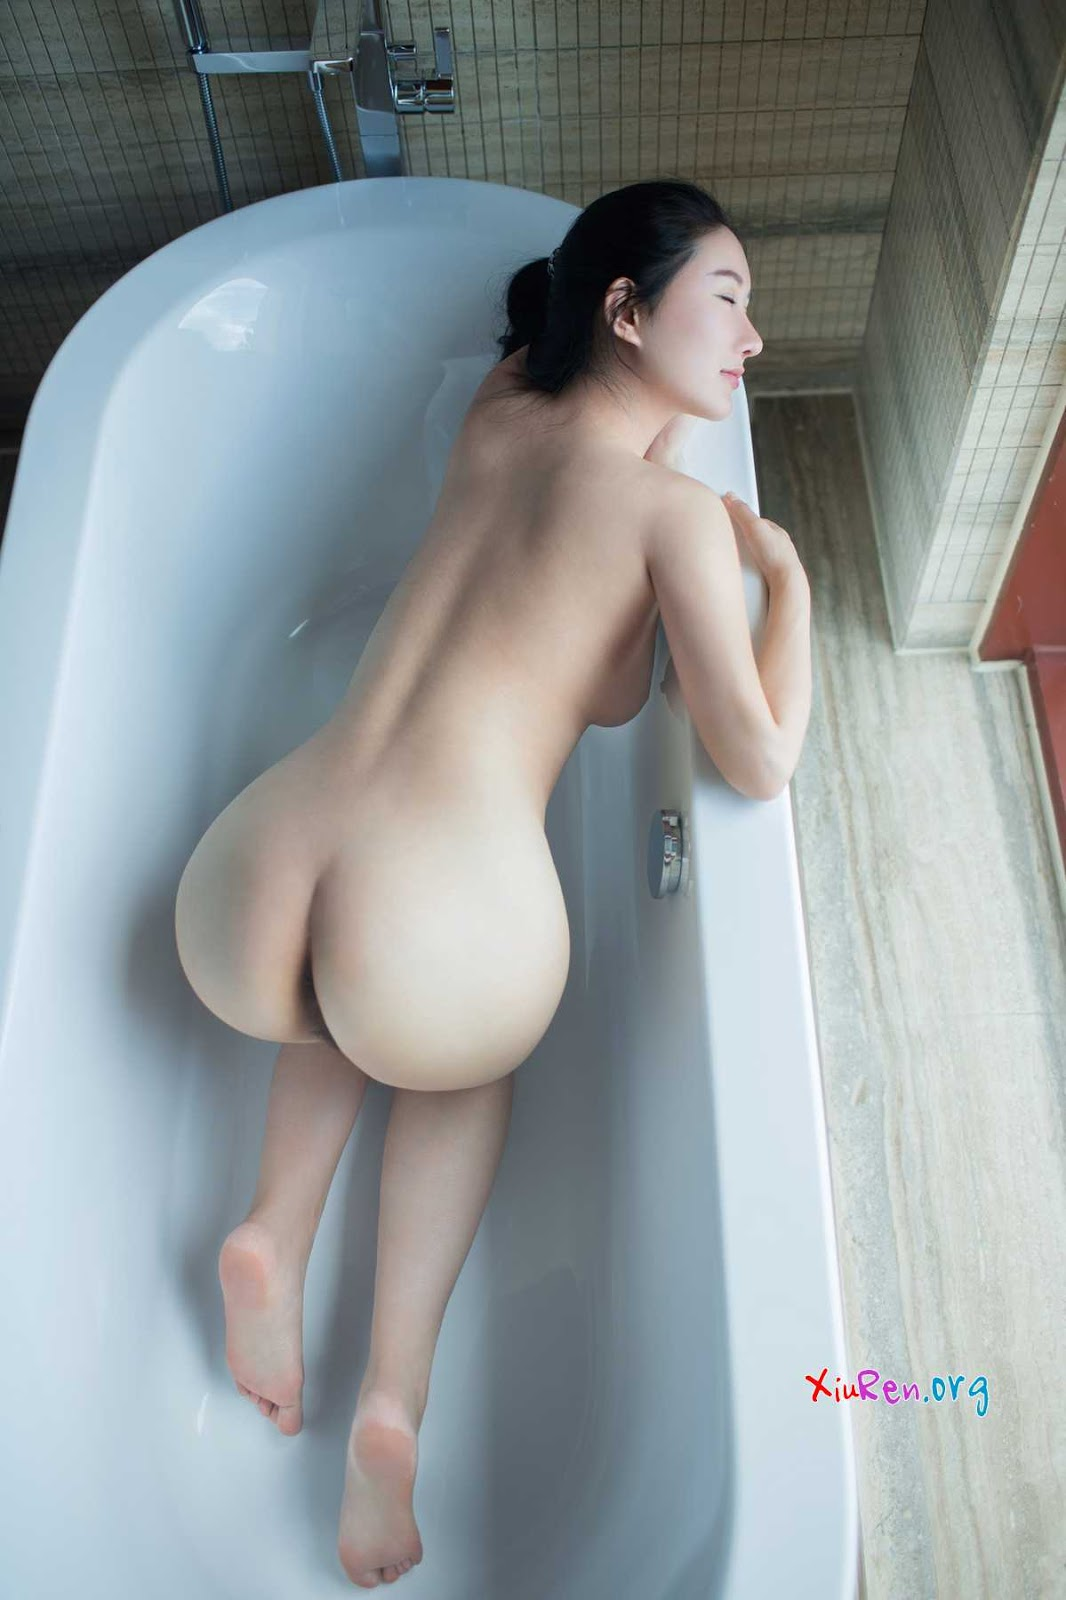 Hottest pornstars to do anal